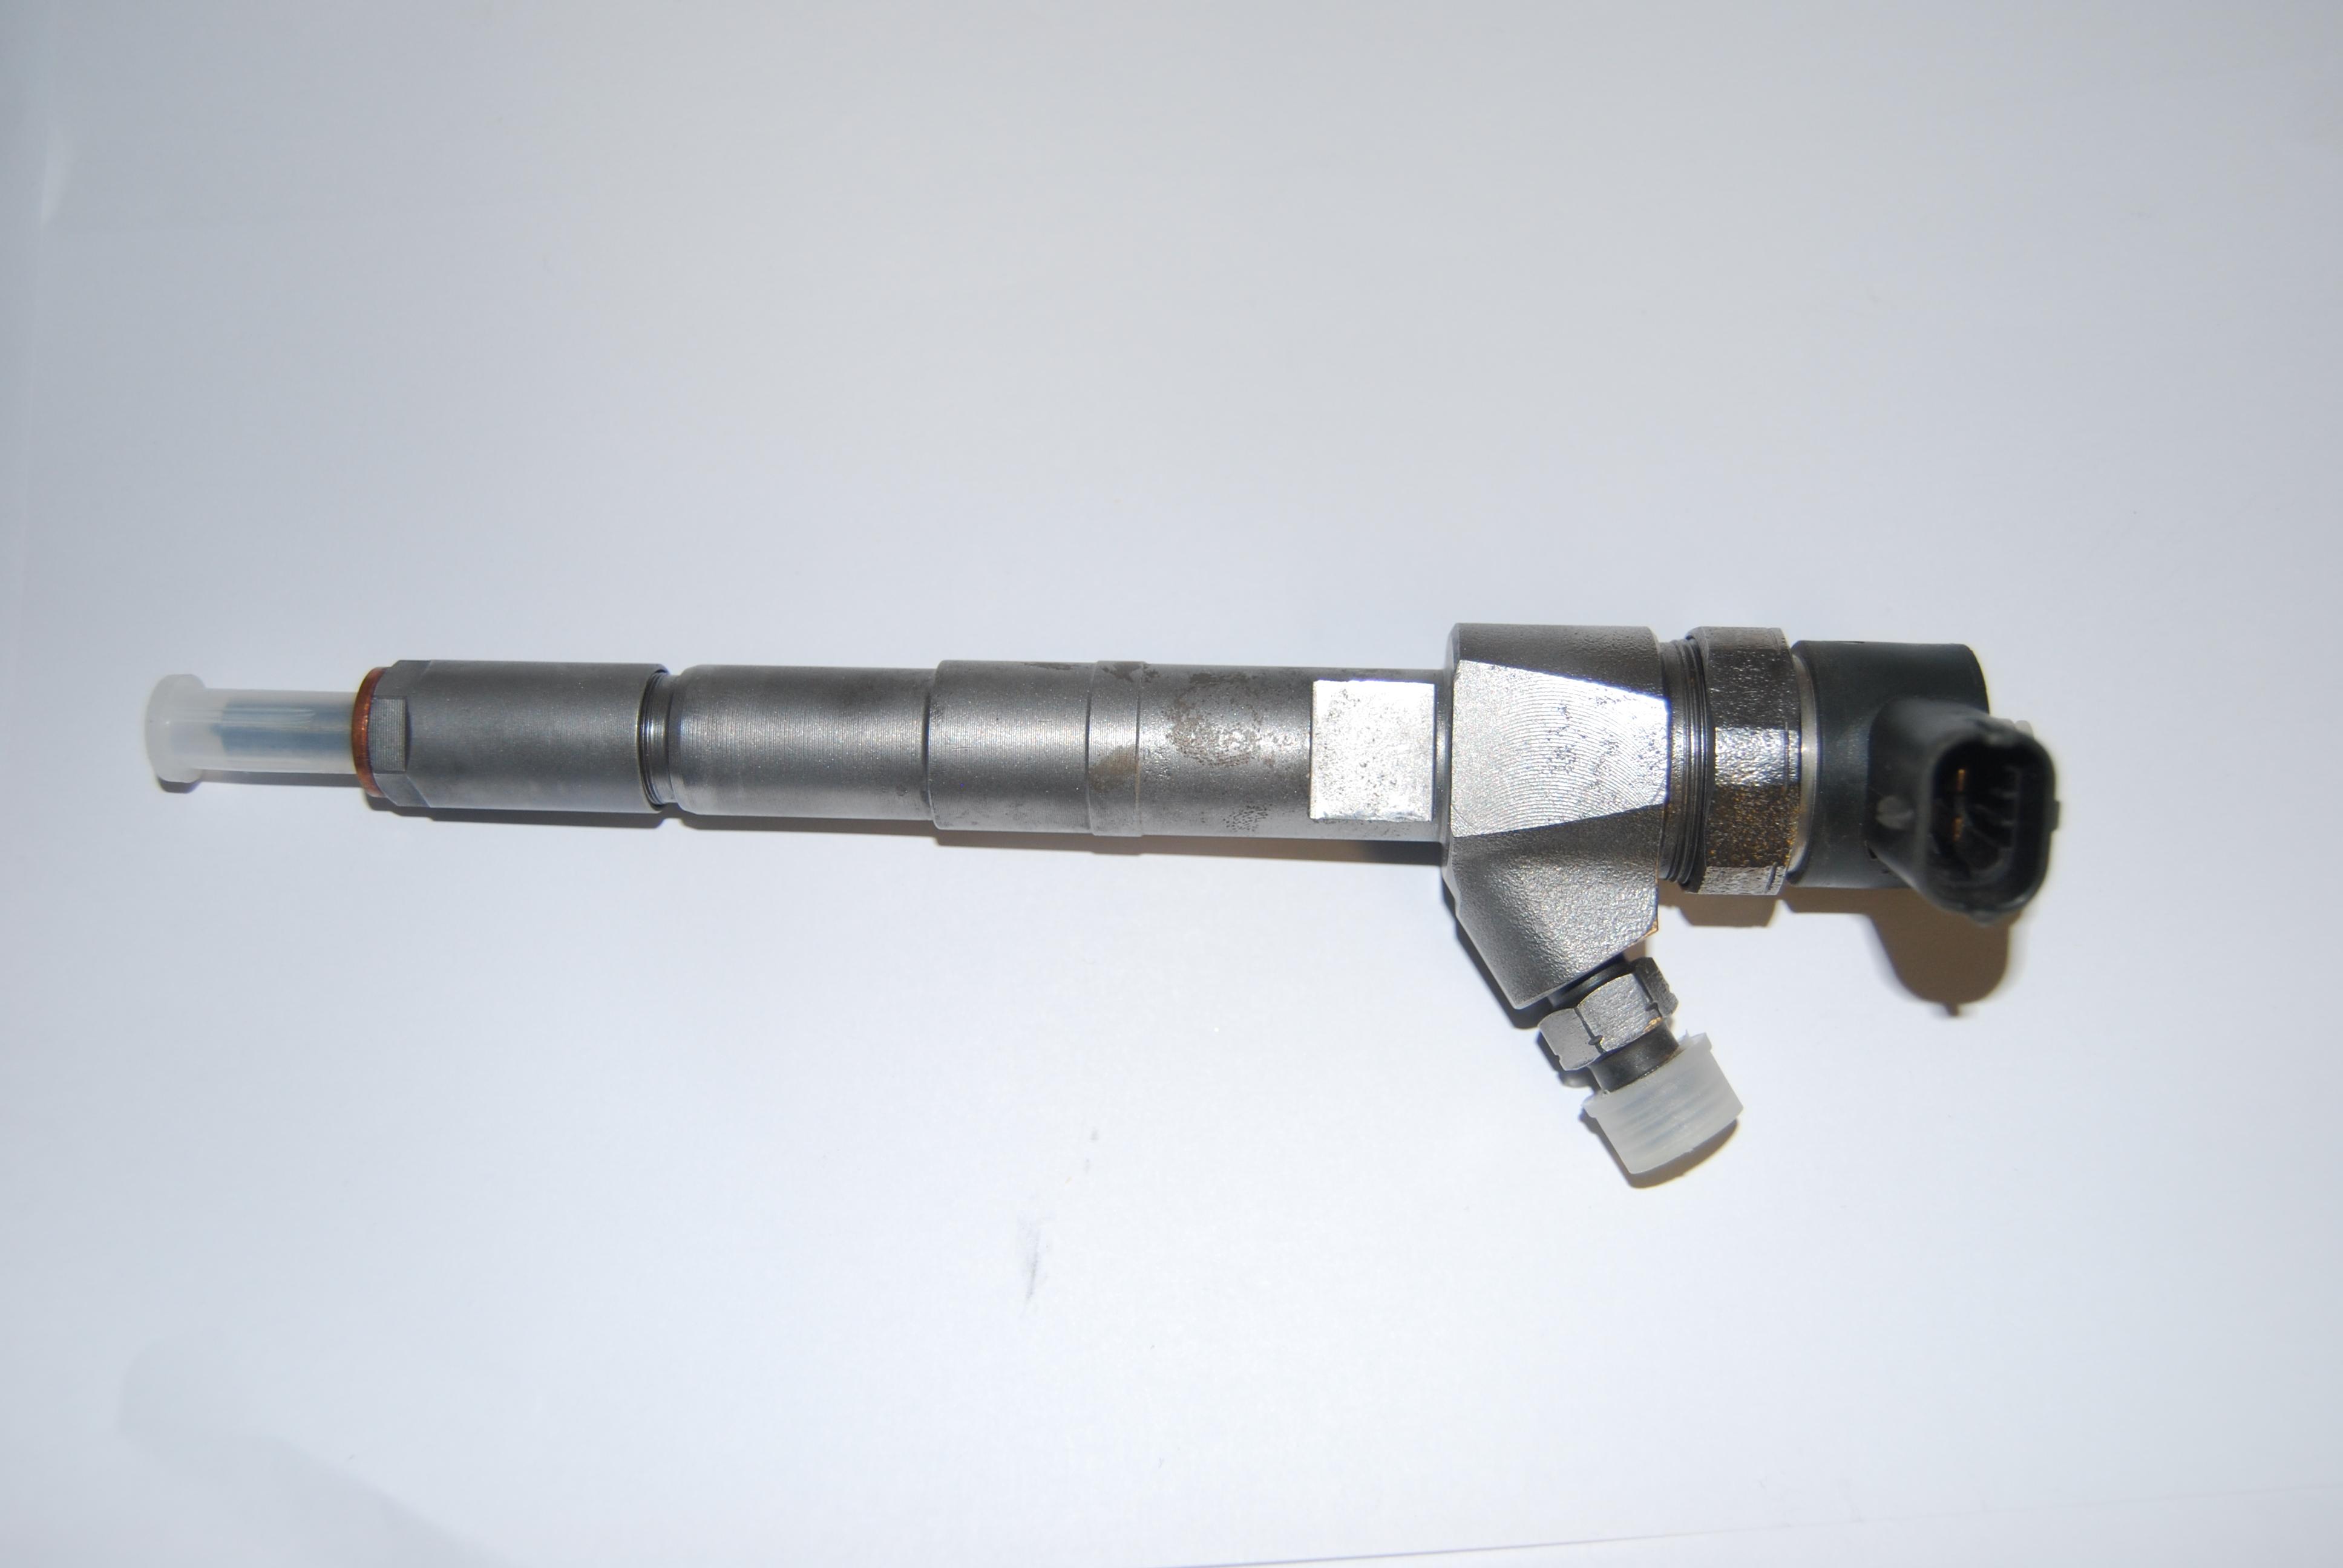 Injektor Einspritzdüse Opel Fiat Astra H Signum Vectra 1,9 CDTI 0445110276